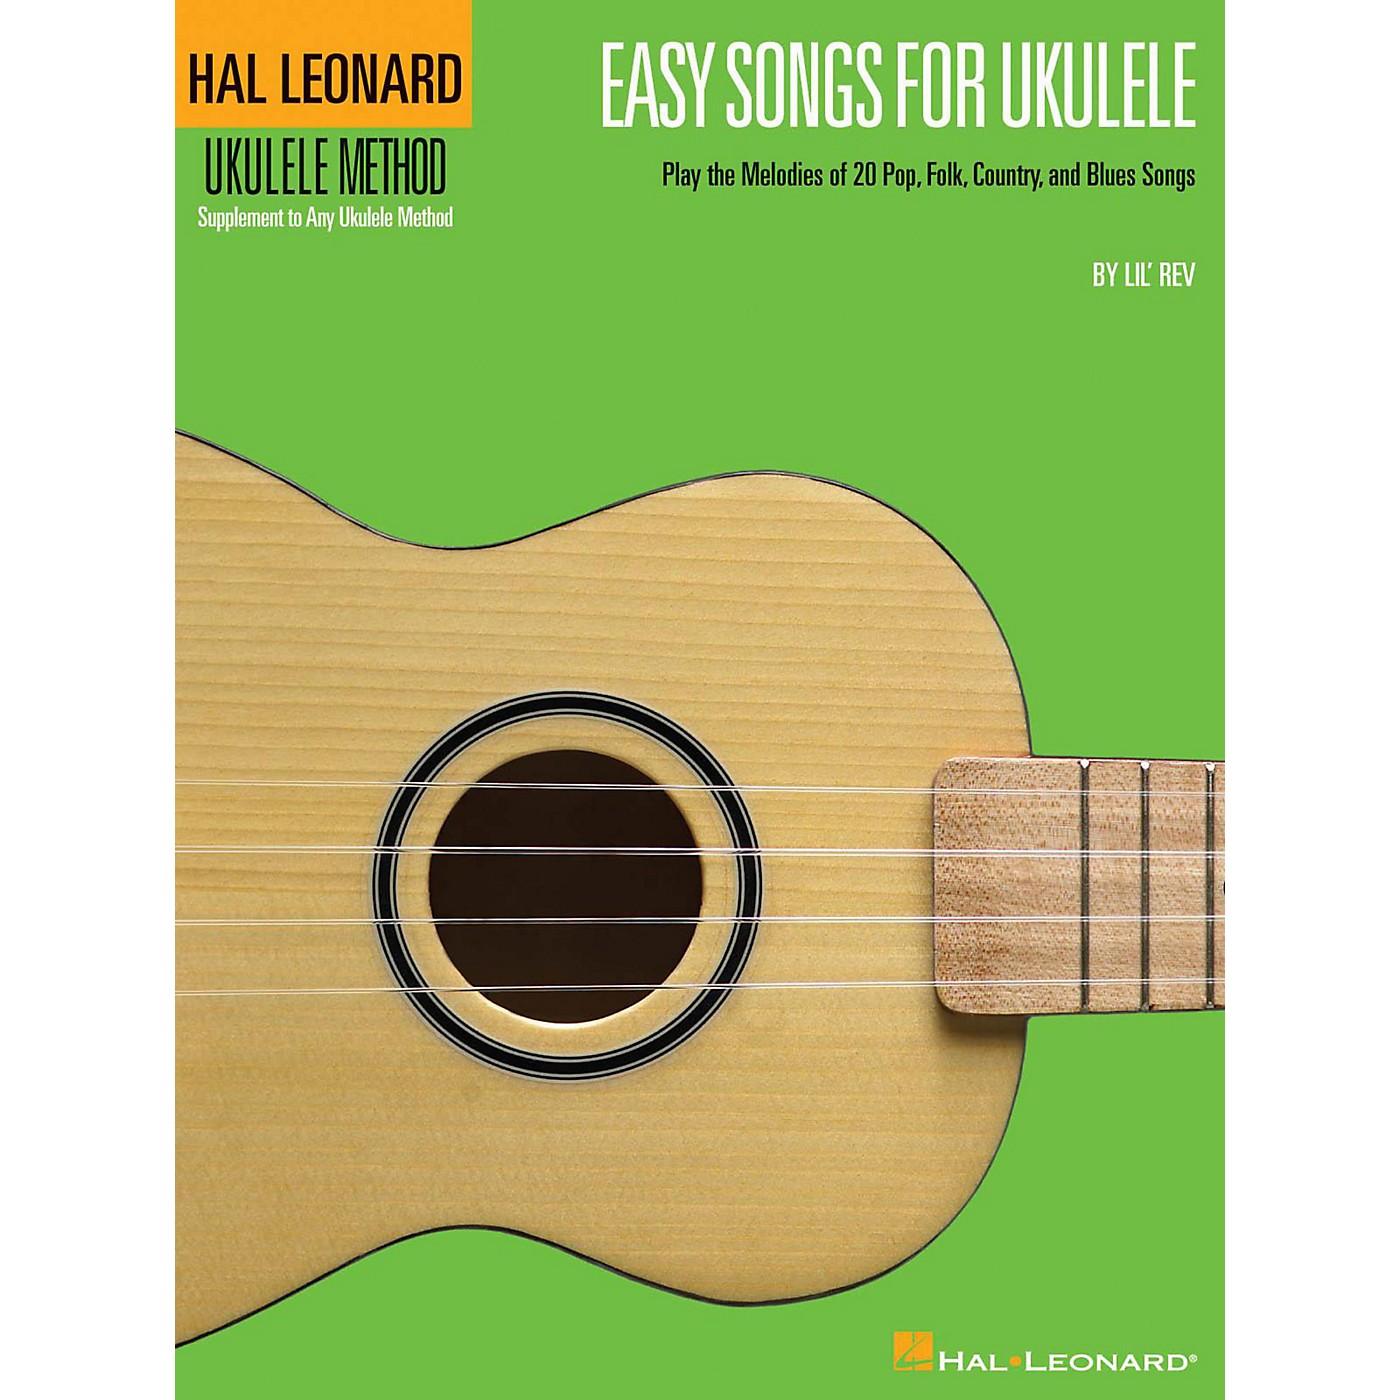 Hal Leonard Easy Songs for Ukulele Book - Supplementary Songbook To The Hal Leonard Ukulele Method thumbnail